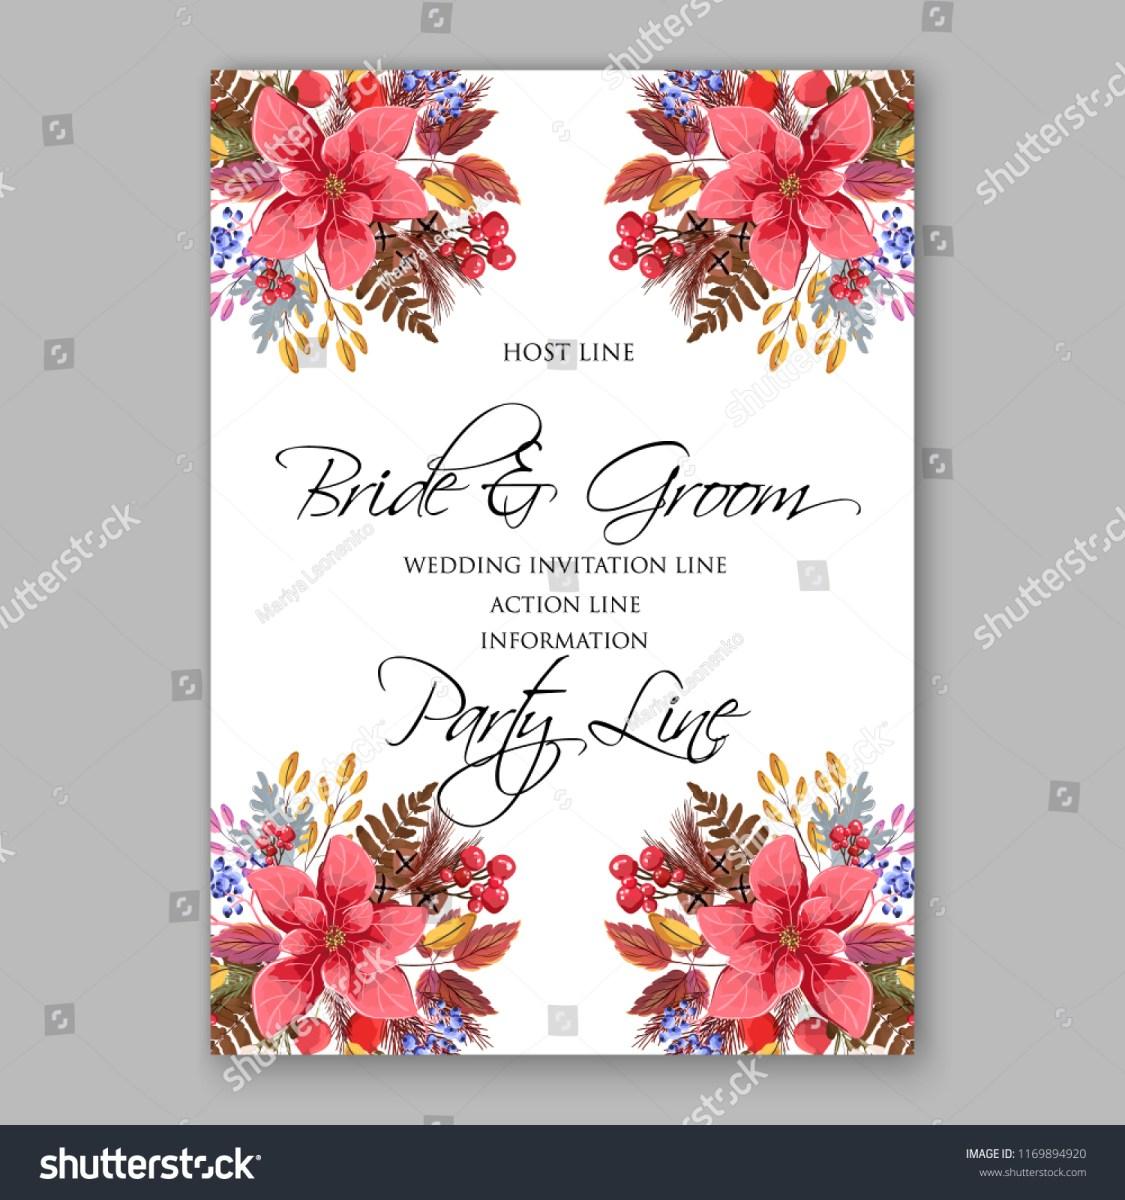 Fall Wedding Invitation Poisettia Autumn Wedding Invitation Fall Leaves Stock Vector